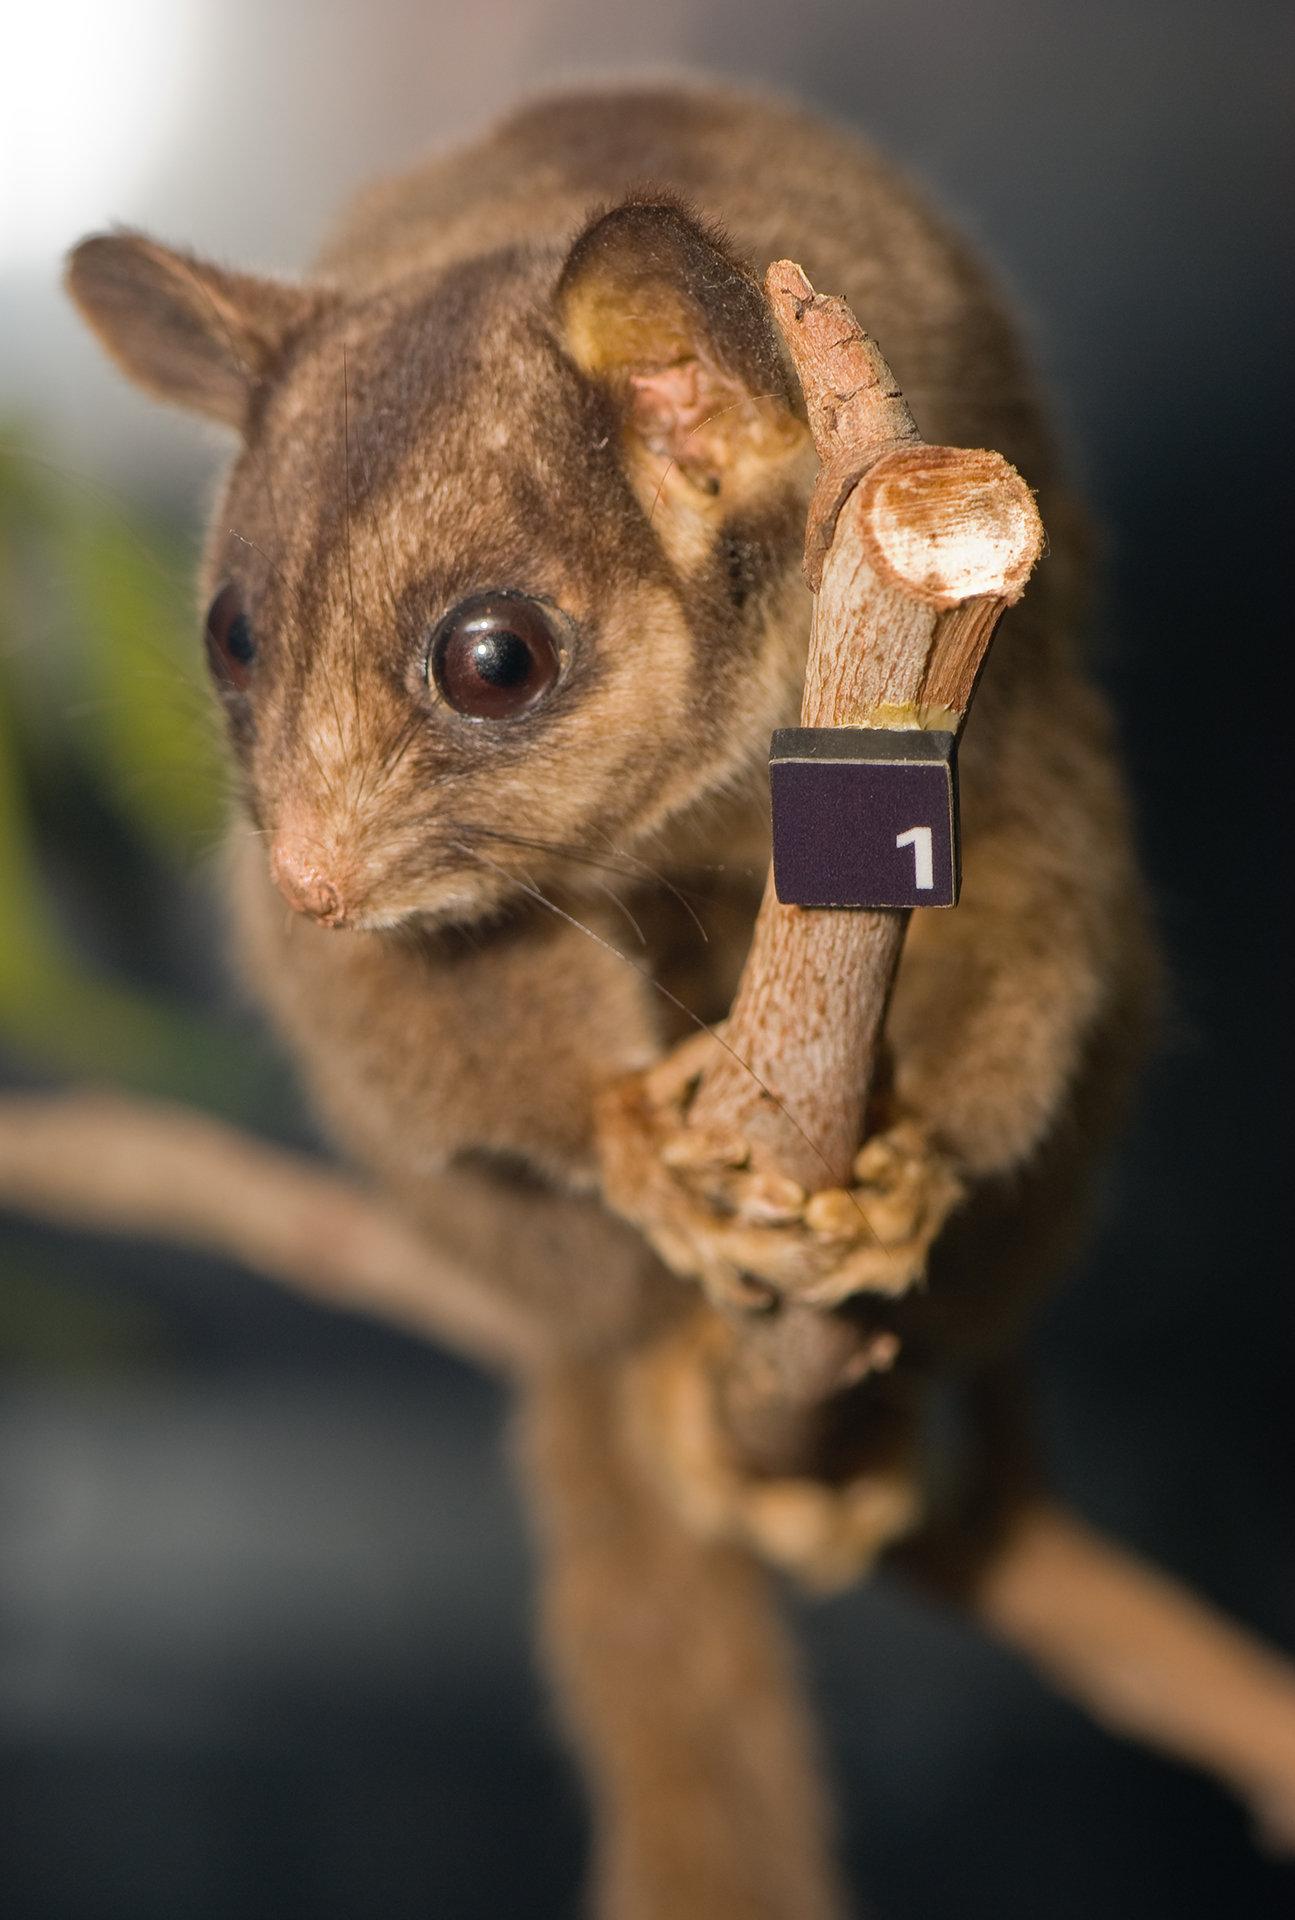 Leadbeater's possum - Wikipedia